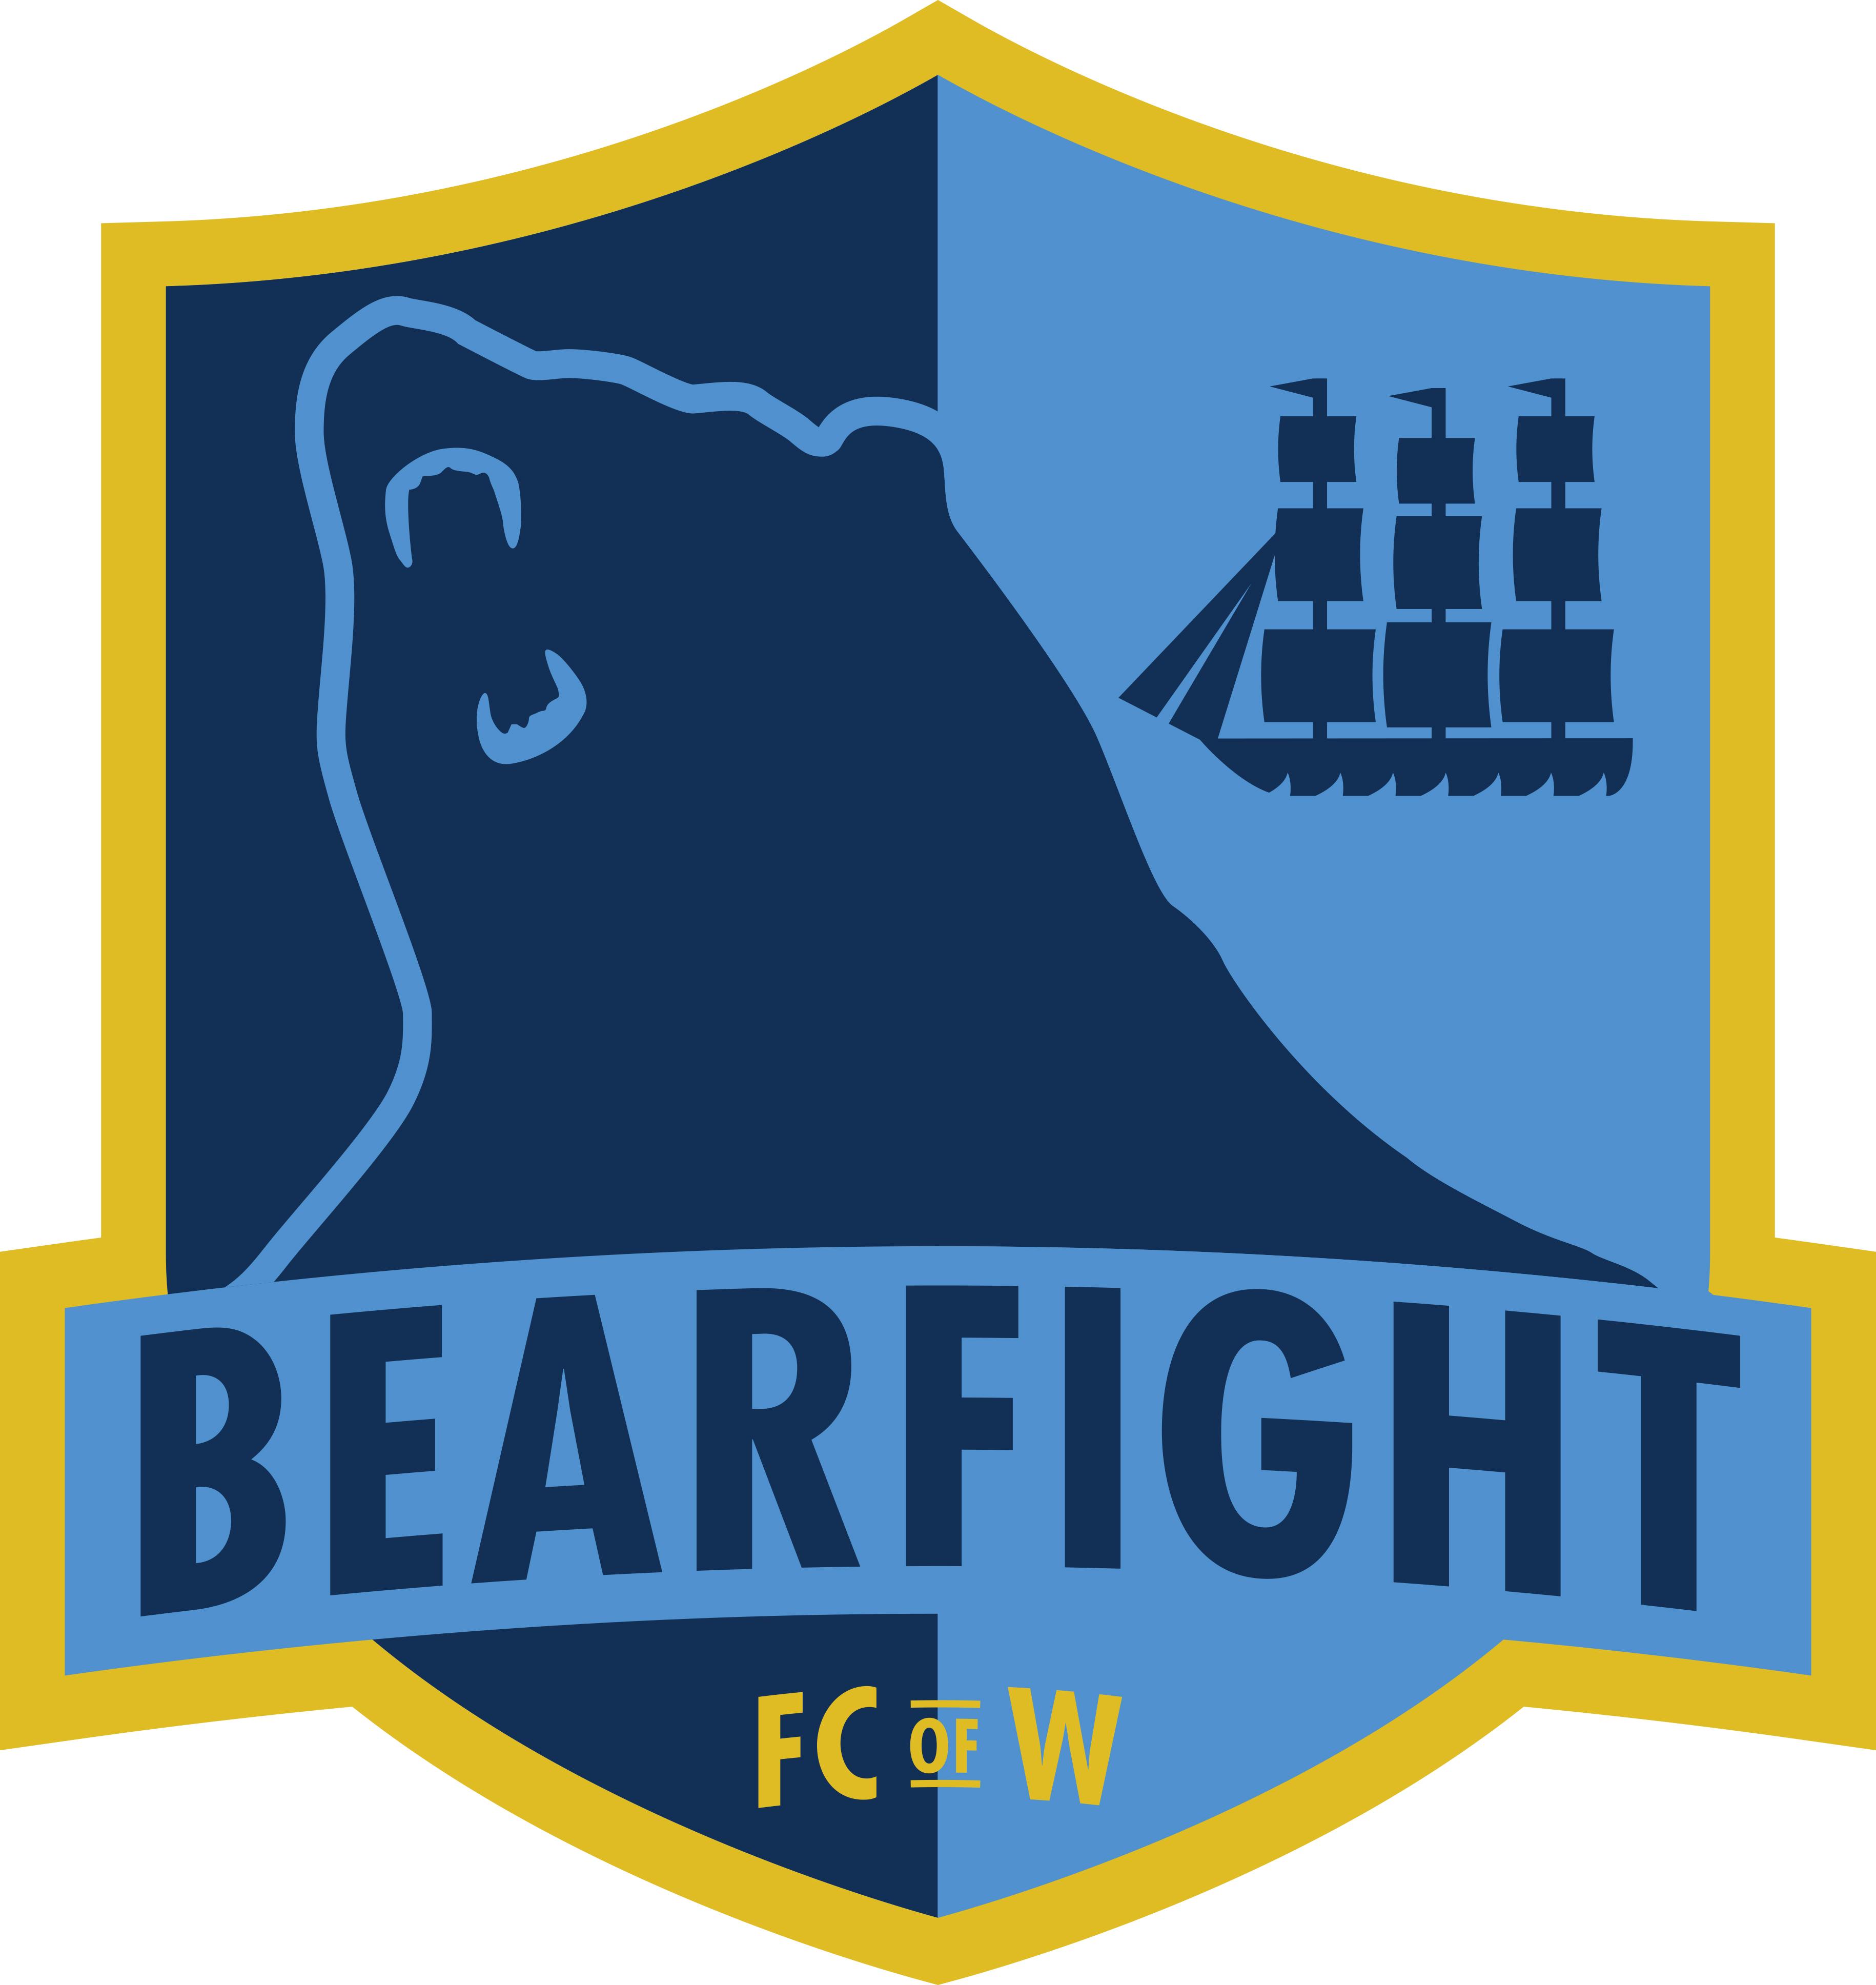 Bearfight FC